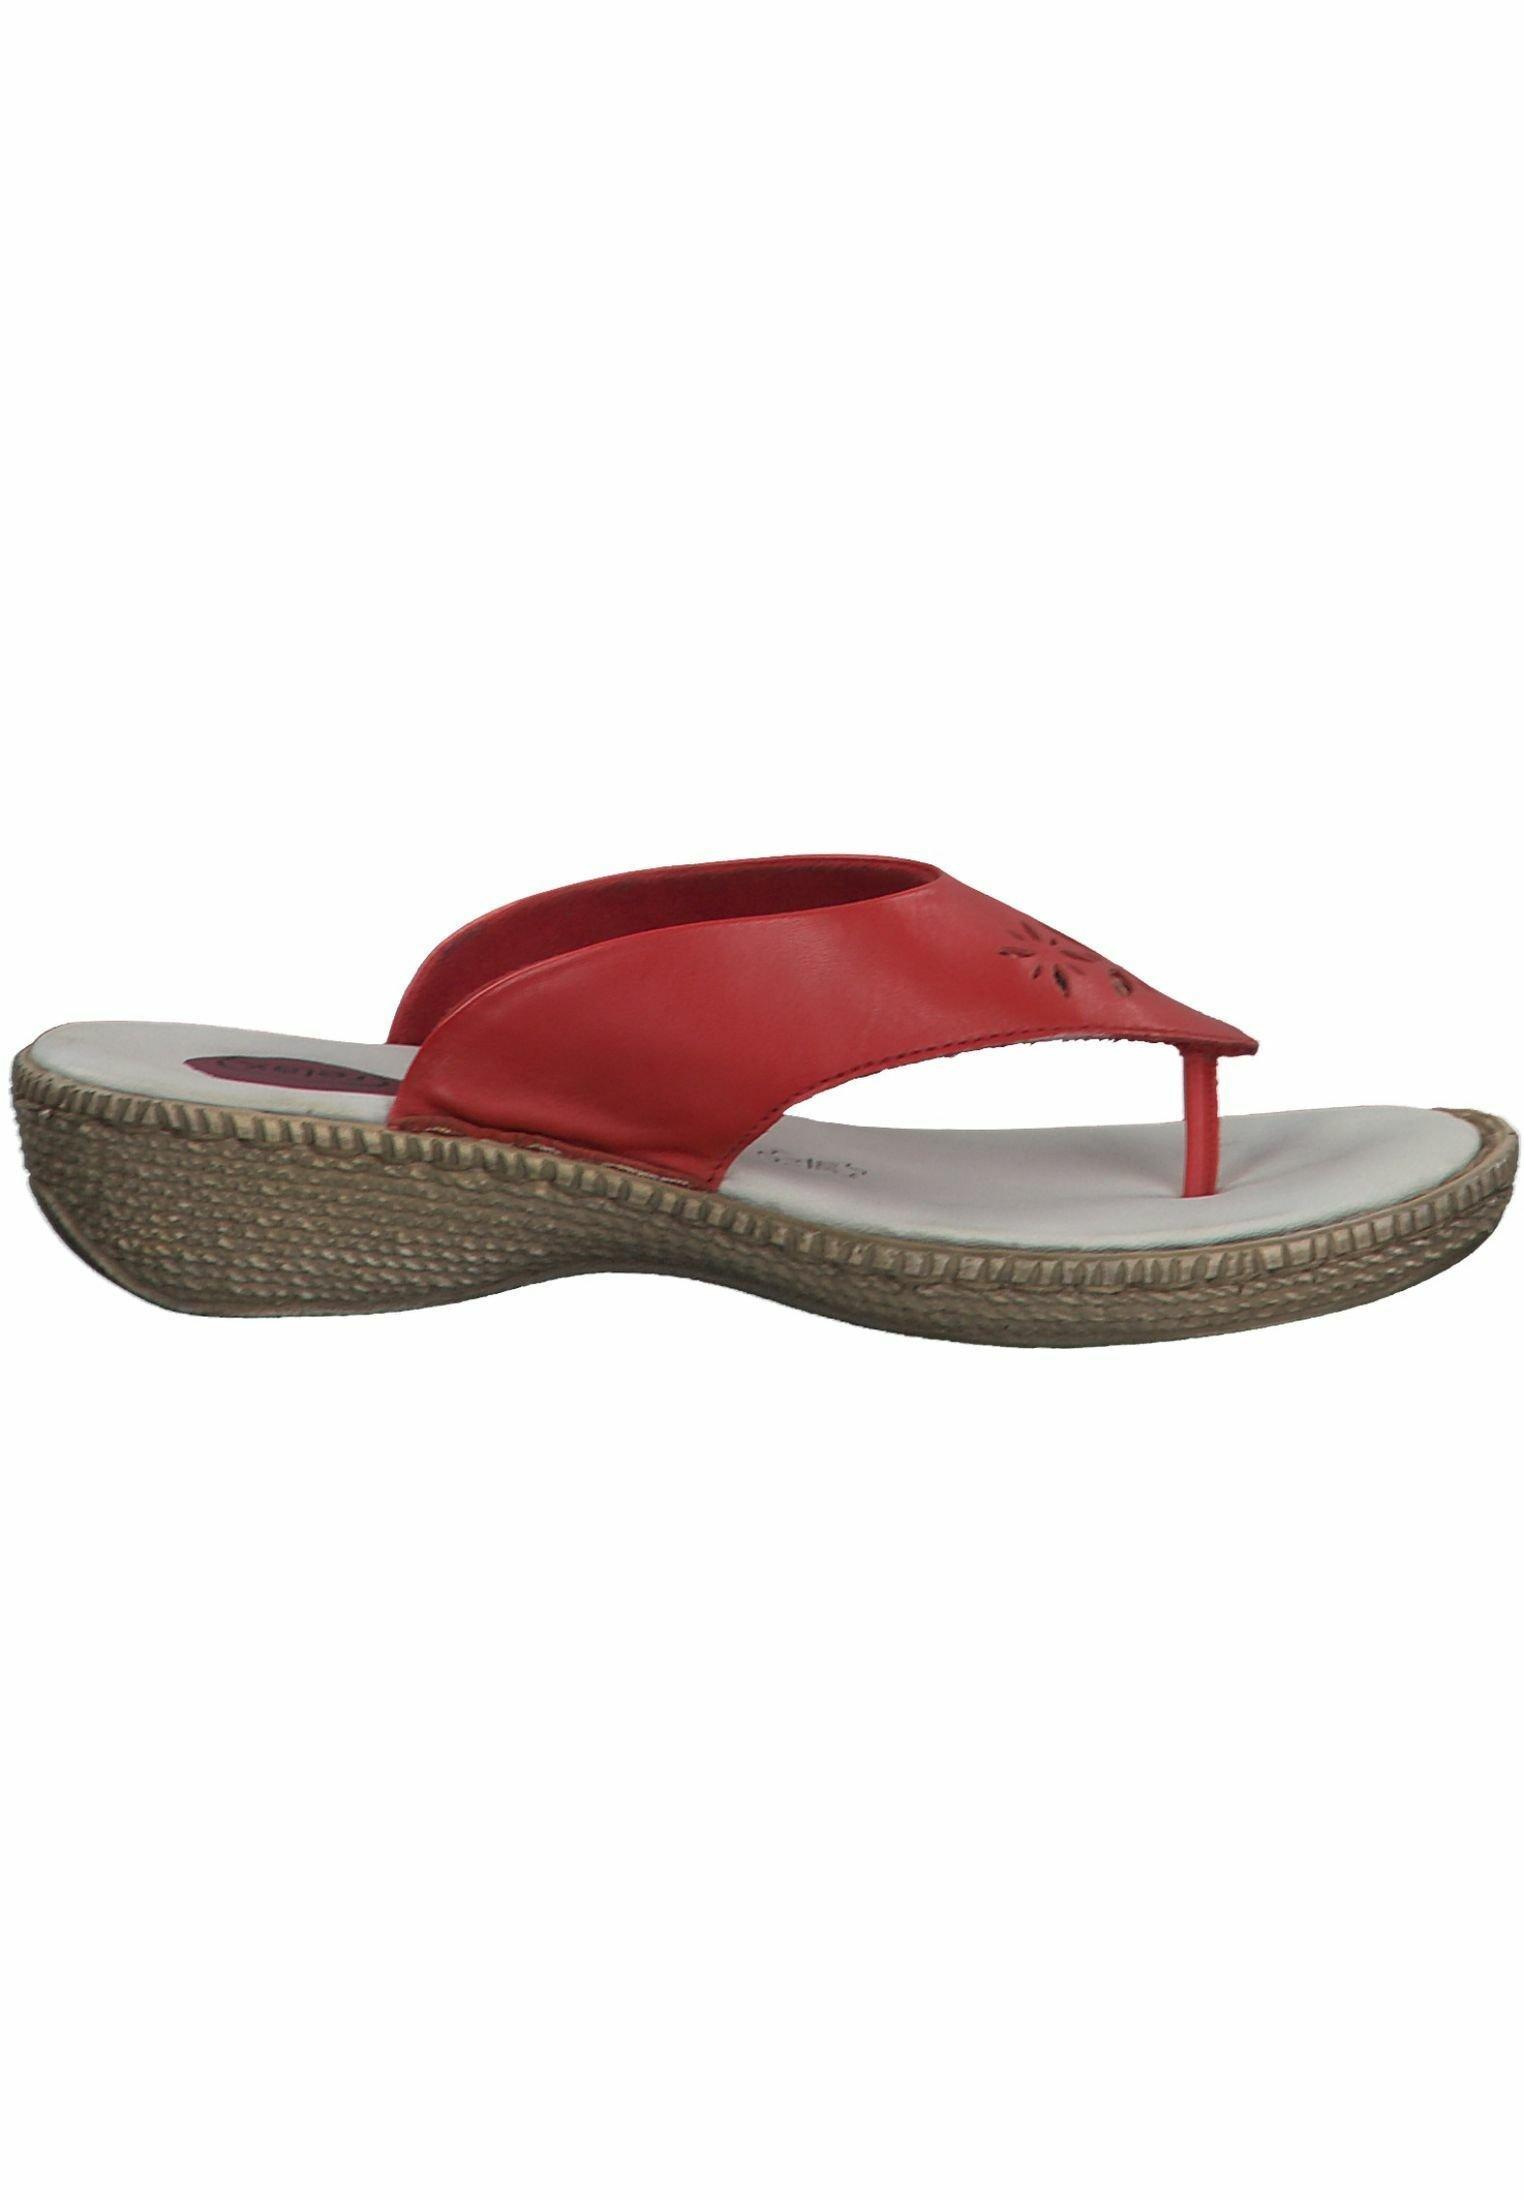 Scarpe da donna Jana Infradito red